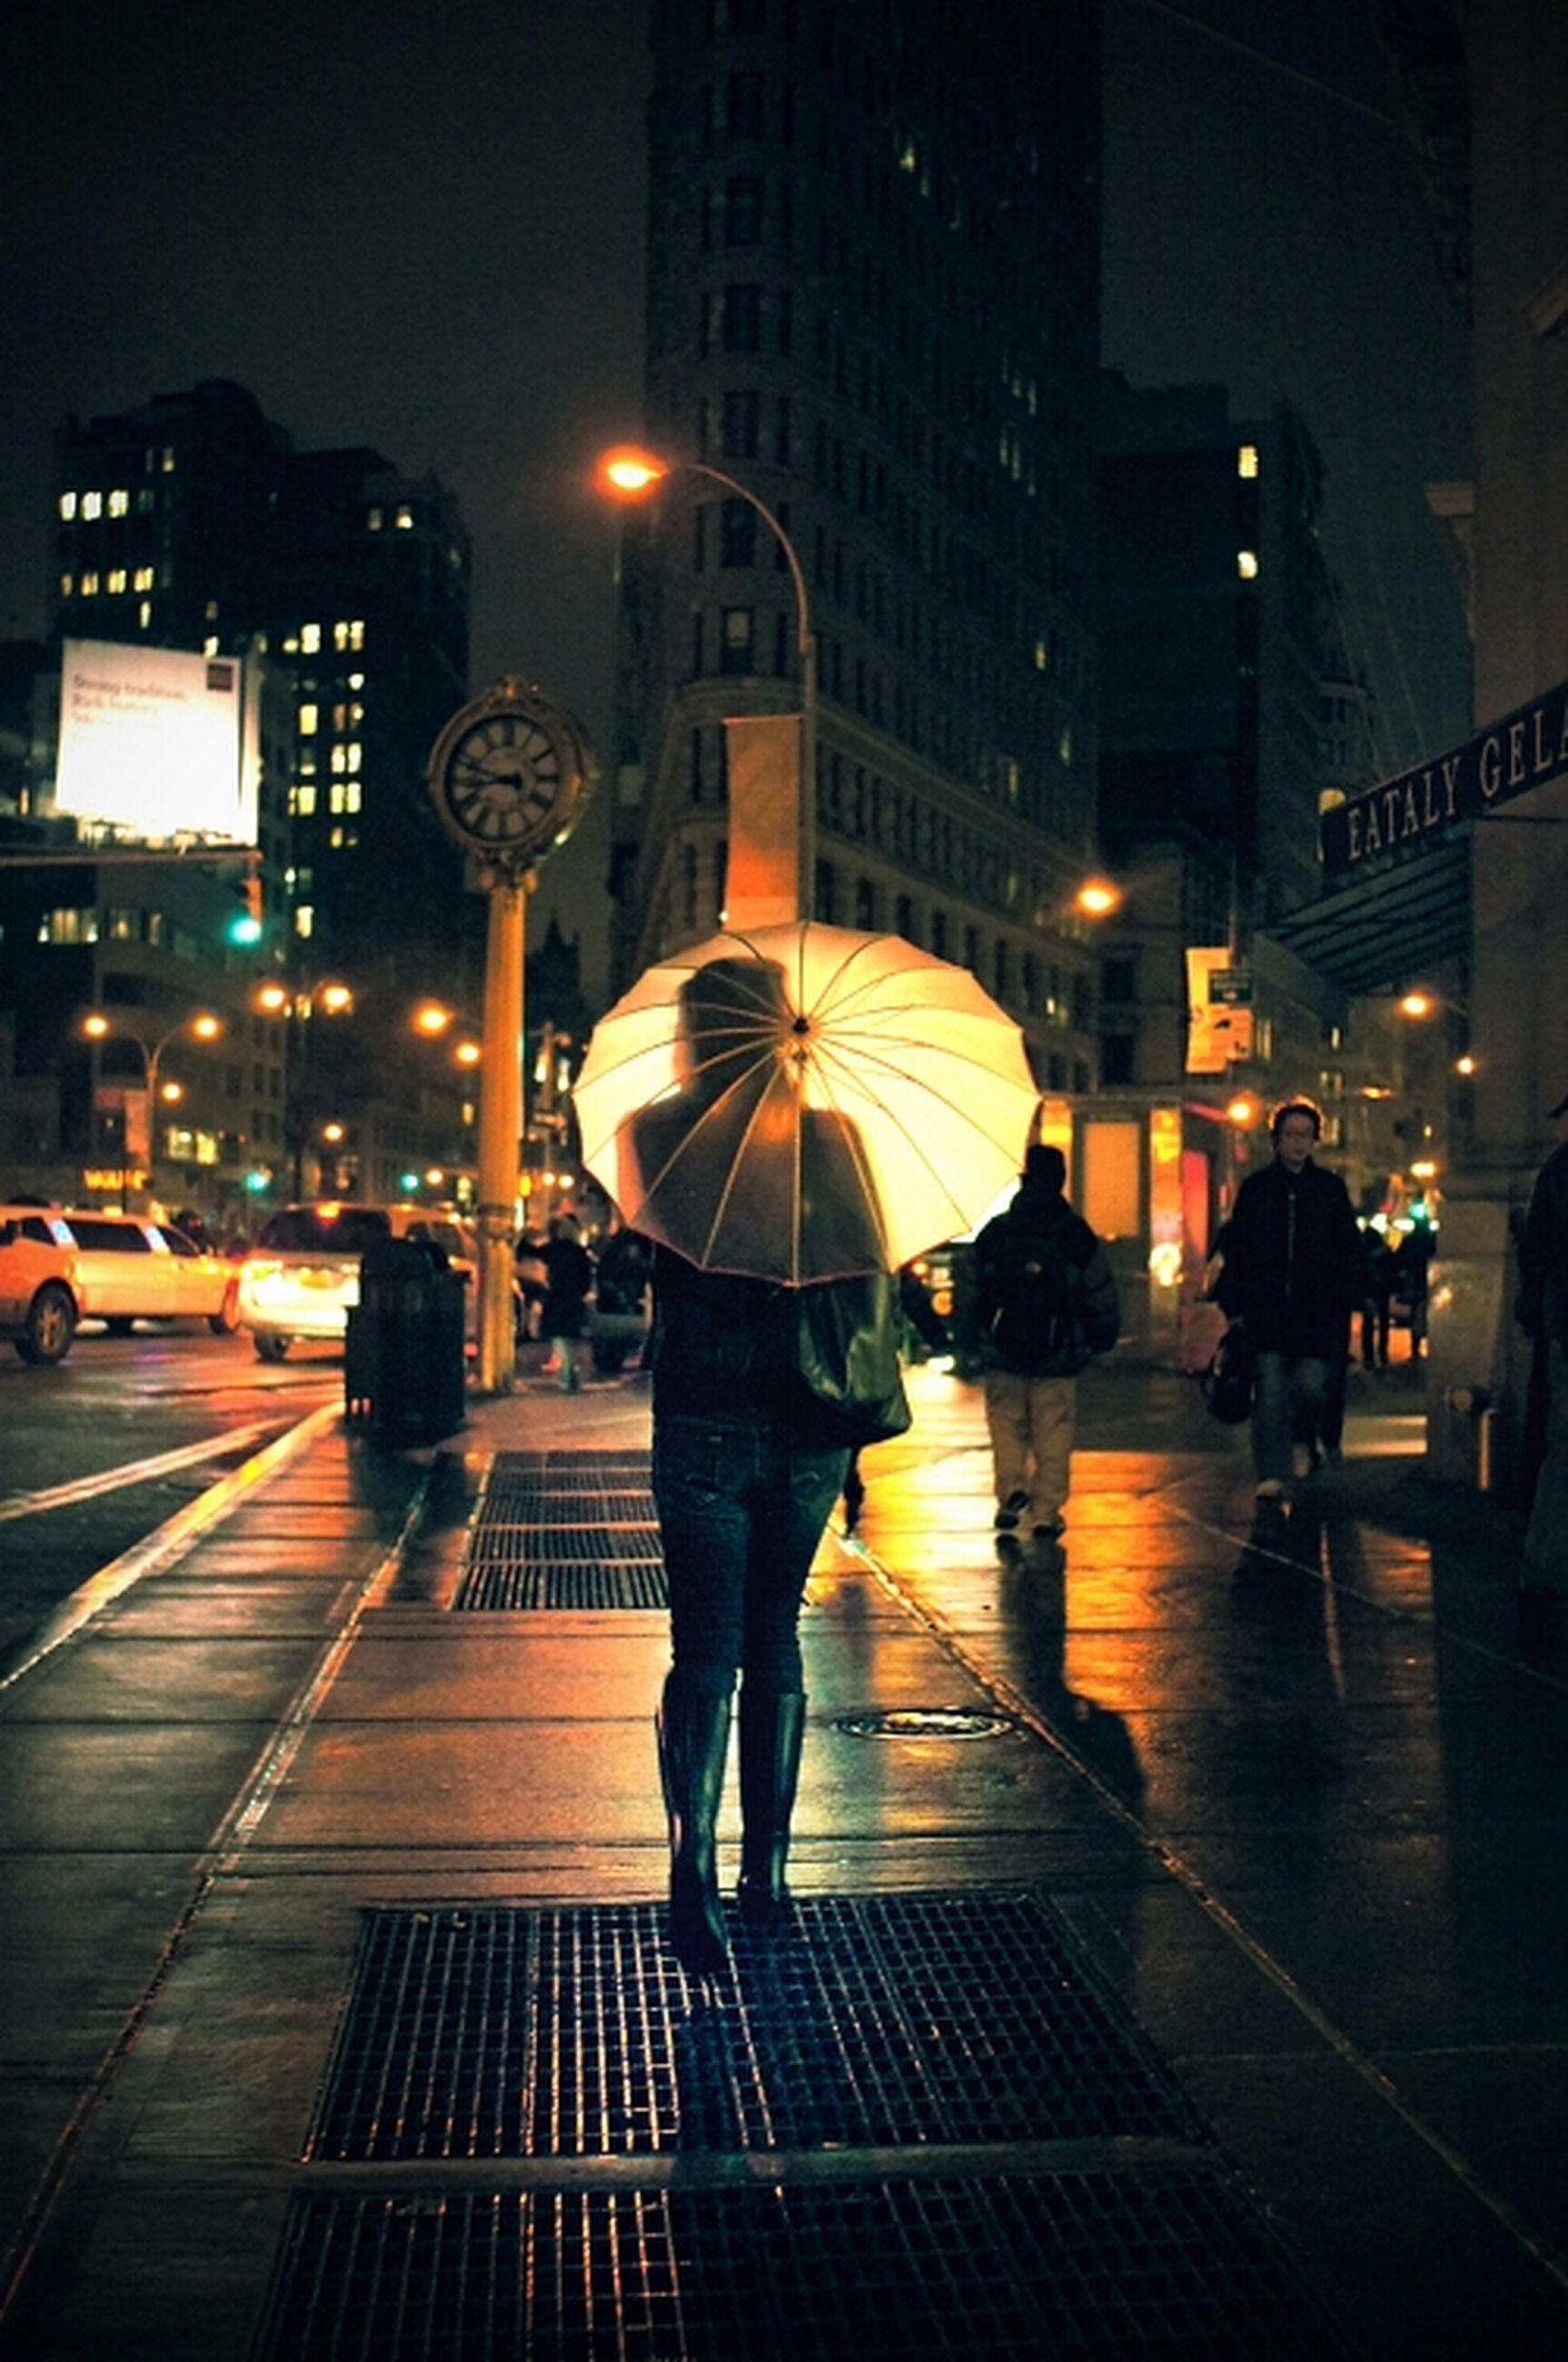 city, building exterior, illuminated, night, architecture, built structure, walking, city life, street, full length, men, city street, lifestyles, rear view, person, transportation, street light, zebra crossing